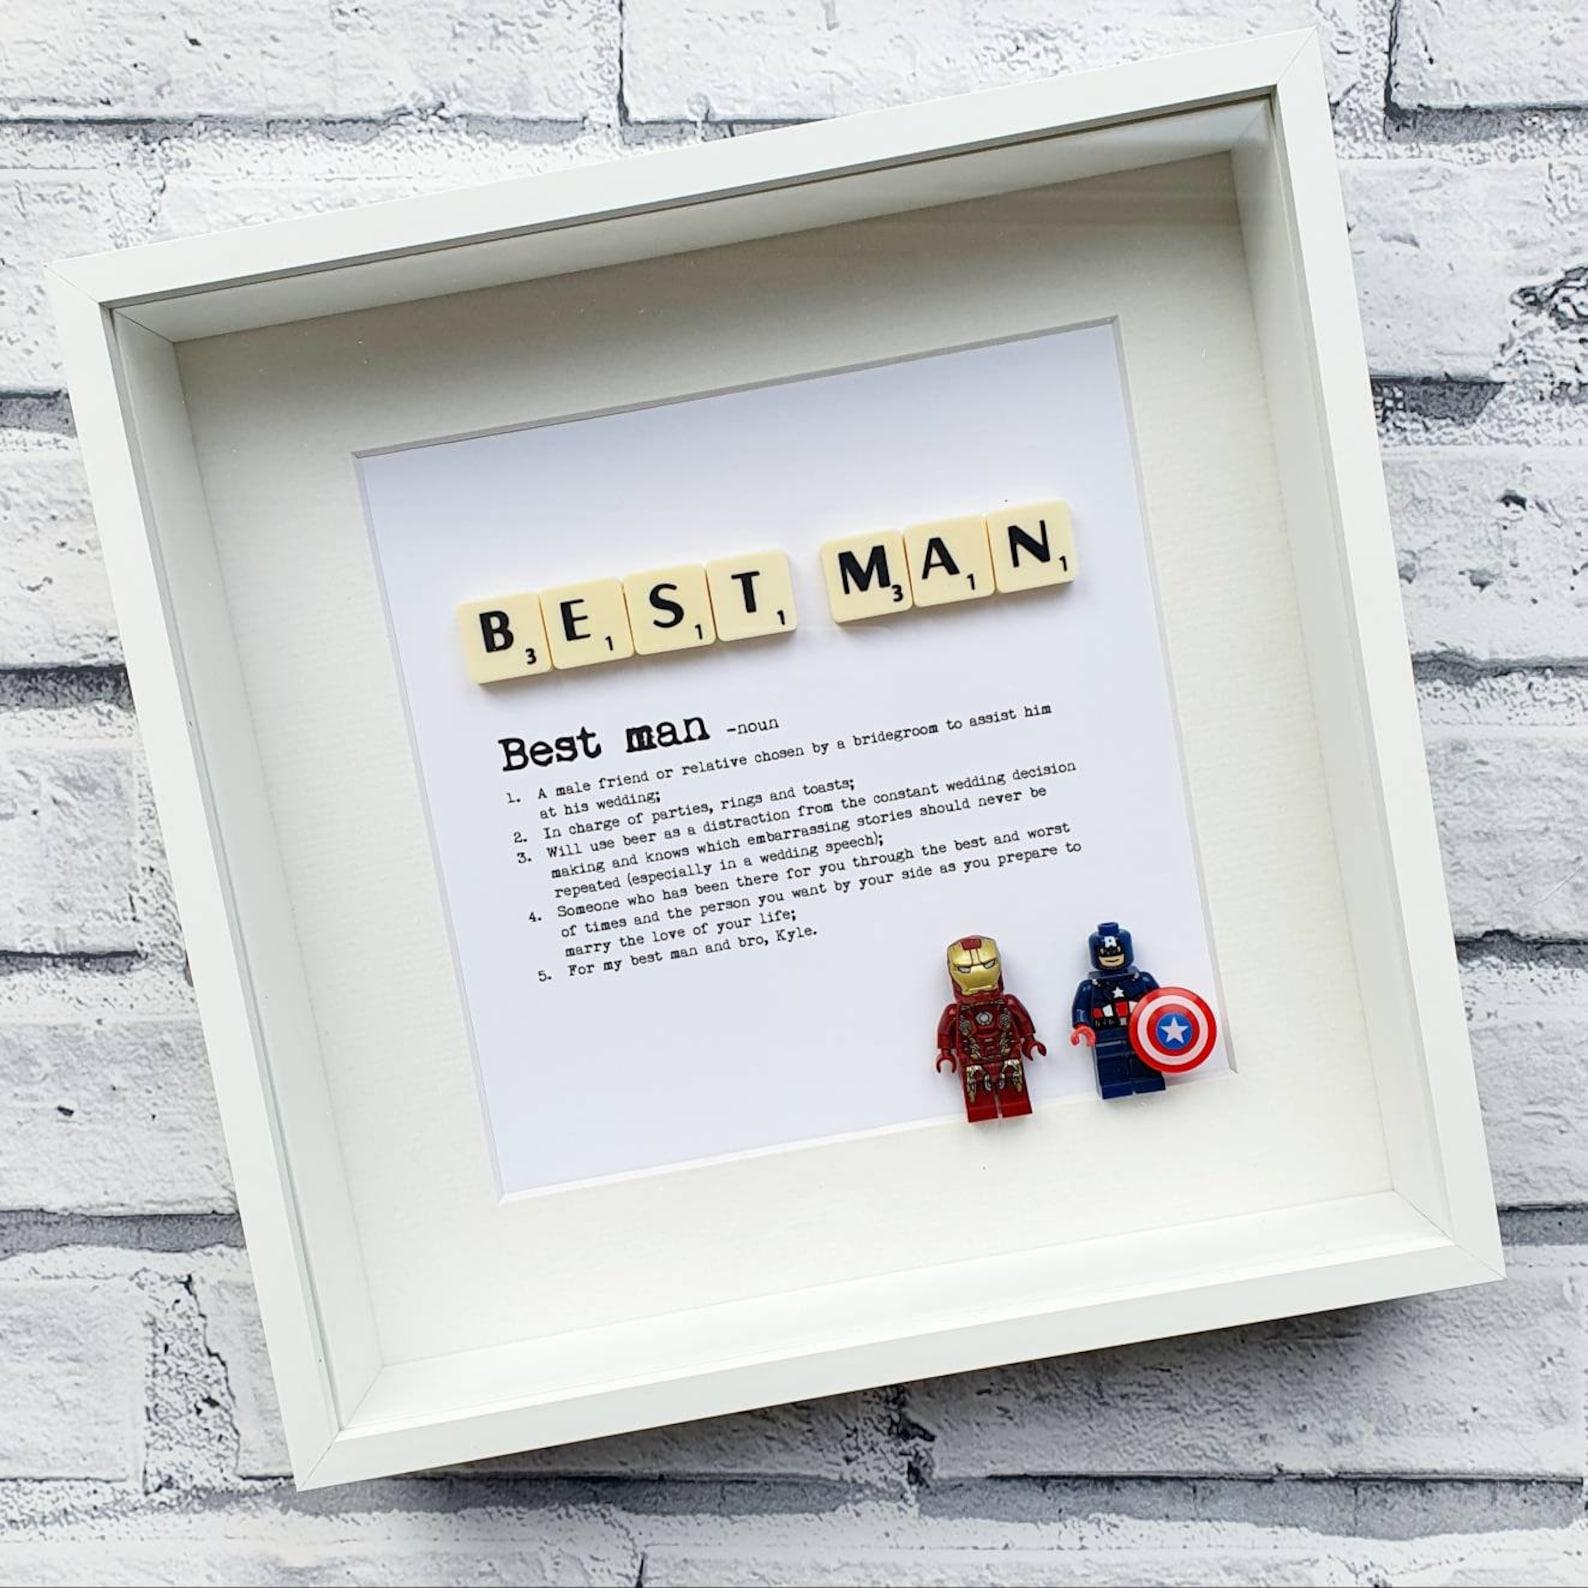 Best Man Definition Minifigure & Scrabble Frame